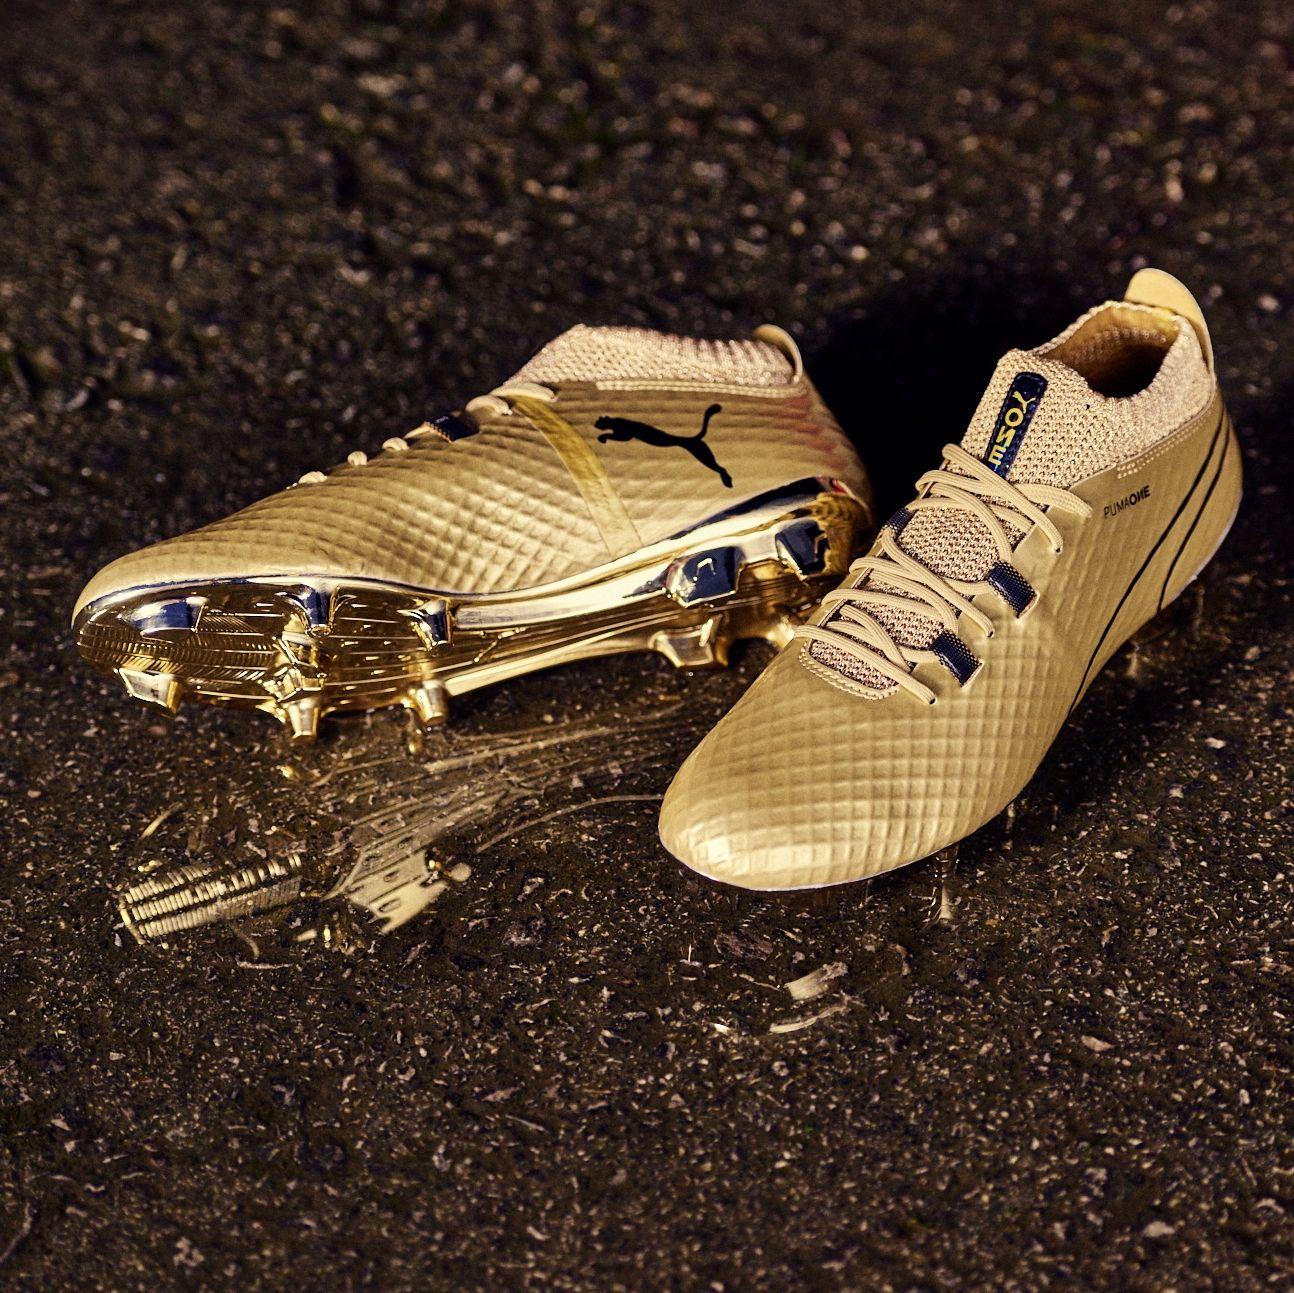 Puma football boots, Soccer boots